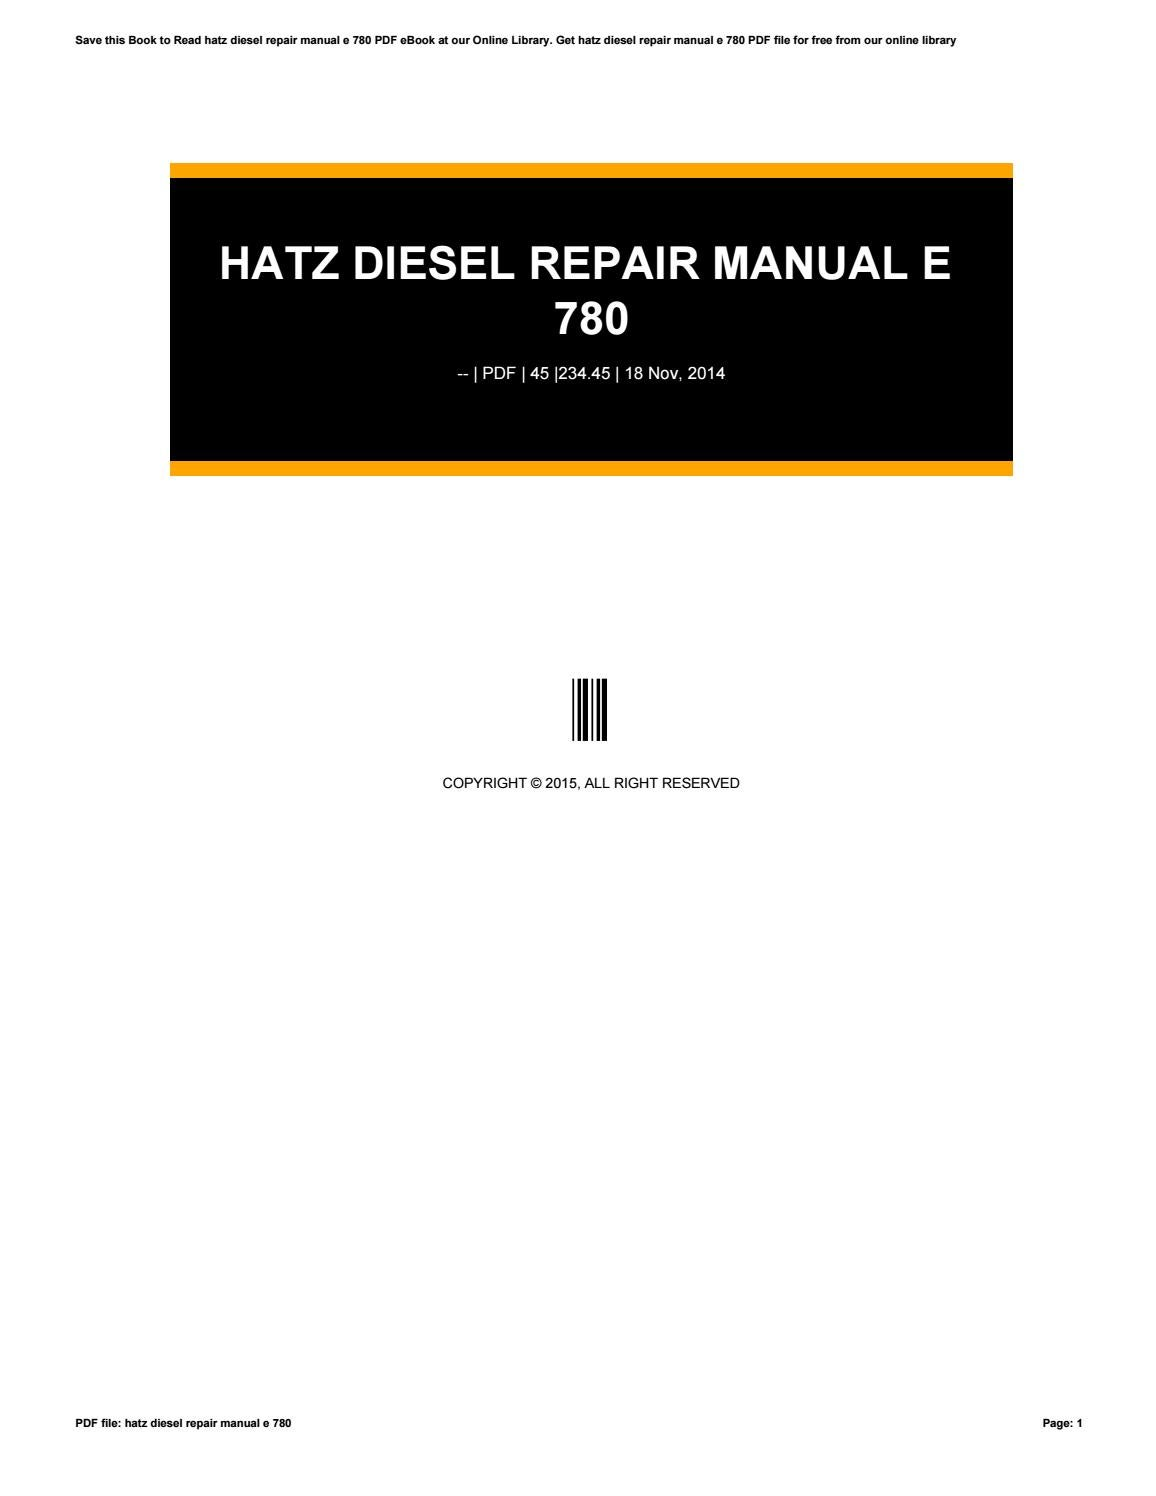 hatz e780 manual ebook Hatz Silent Pack Alternator Wiring Diagram on